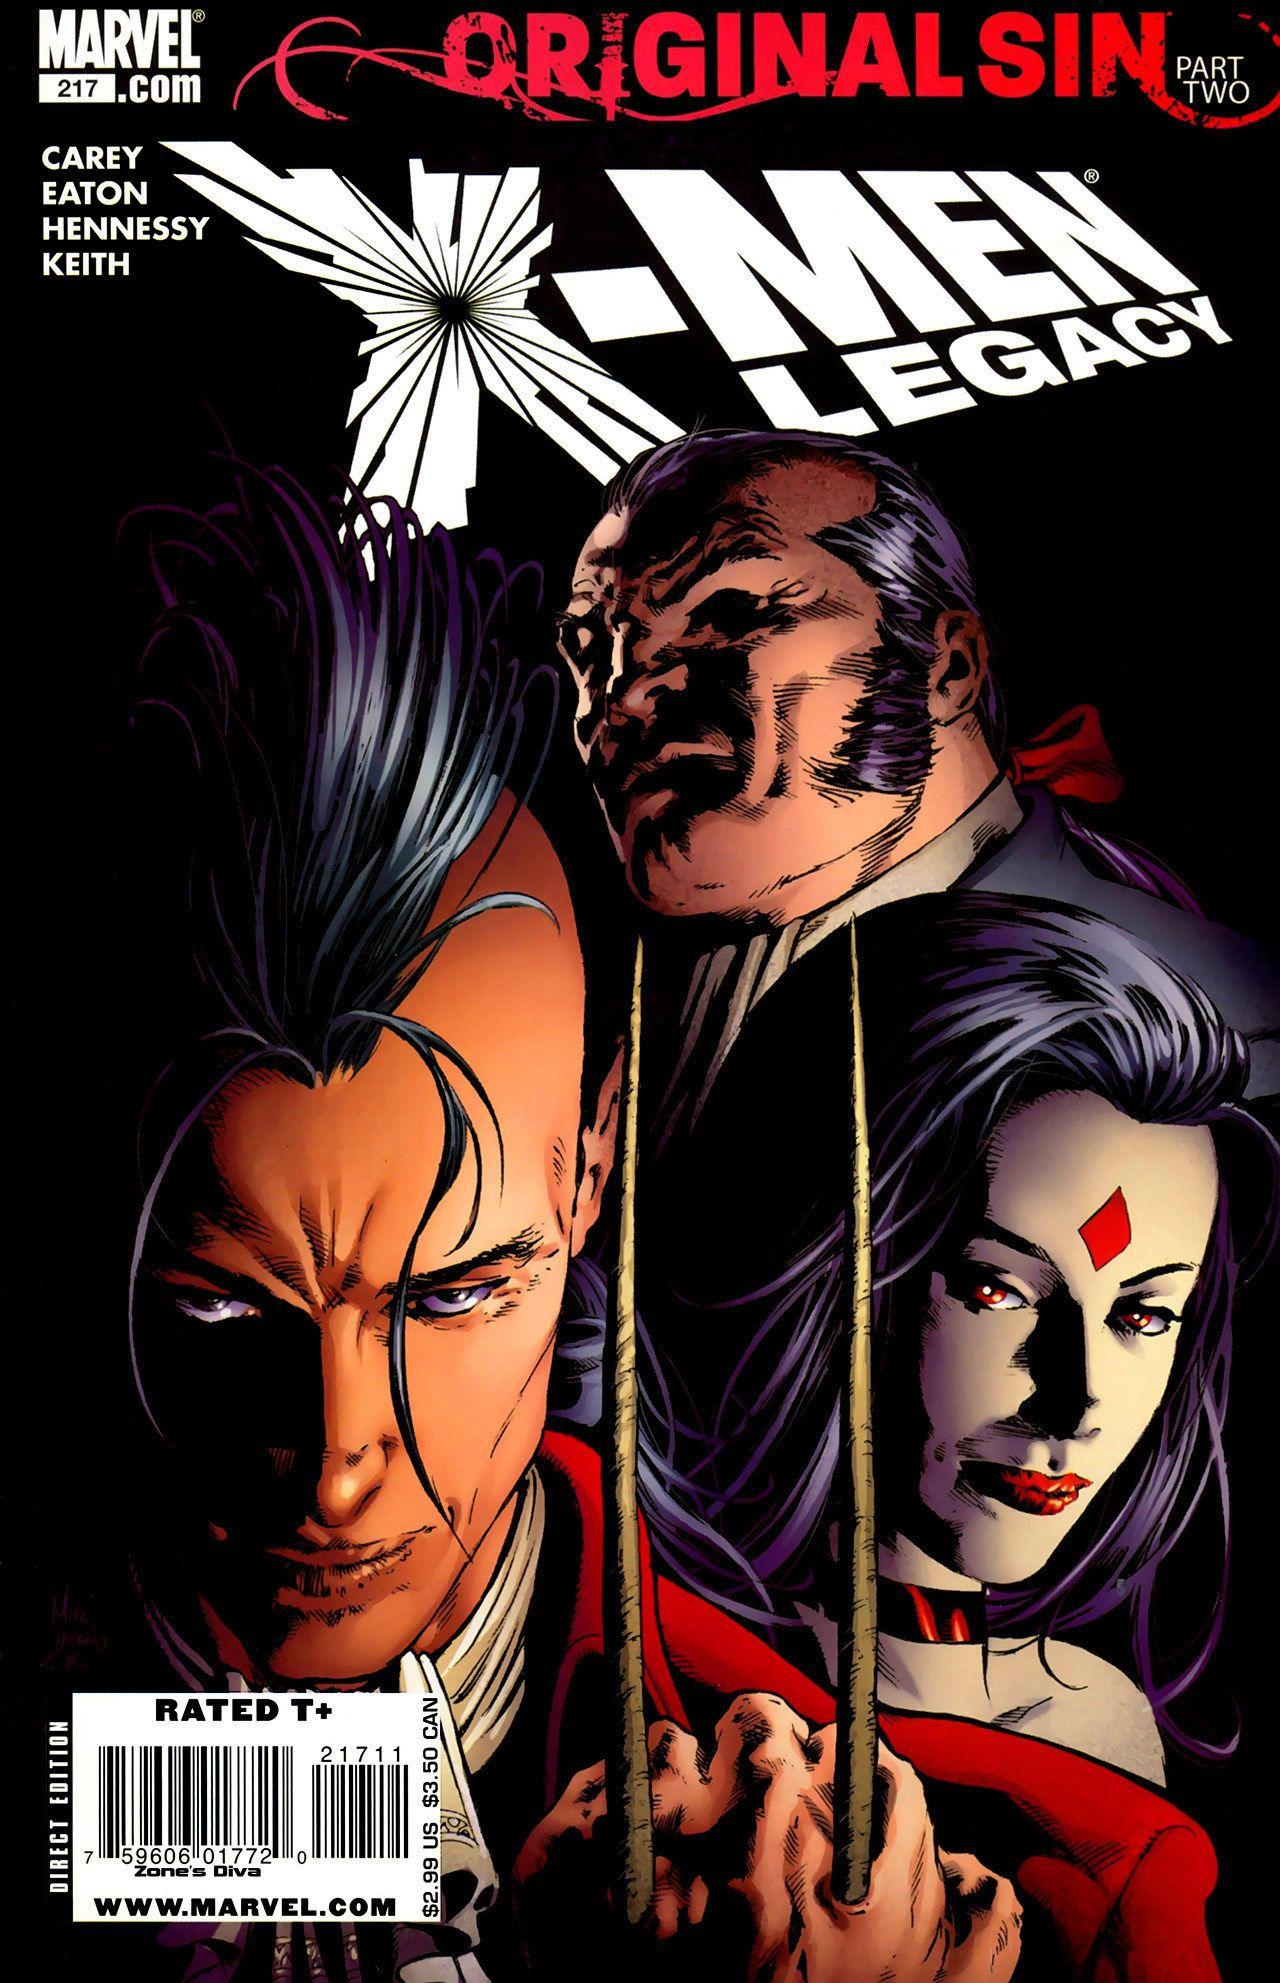 X Men Legacy Vol 1 217 Cover Art By Mike Deodato Jr Comic Book Villains Comics X Men